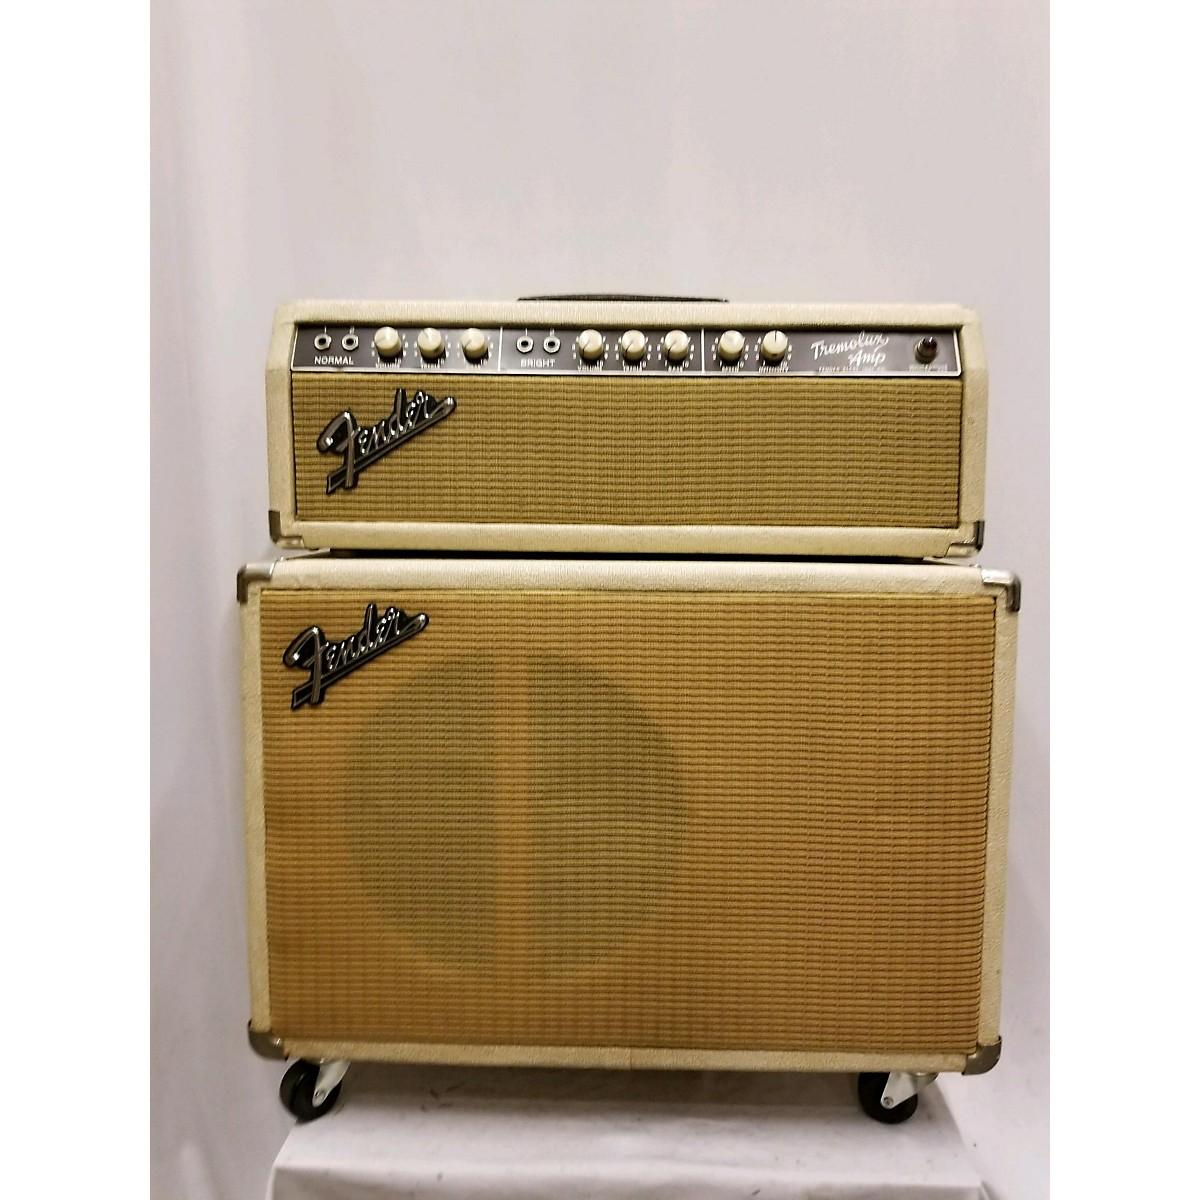 Fender Tremolux Piggyback Set Tube Guitar Amp Head